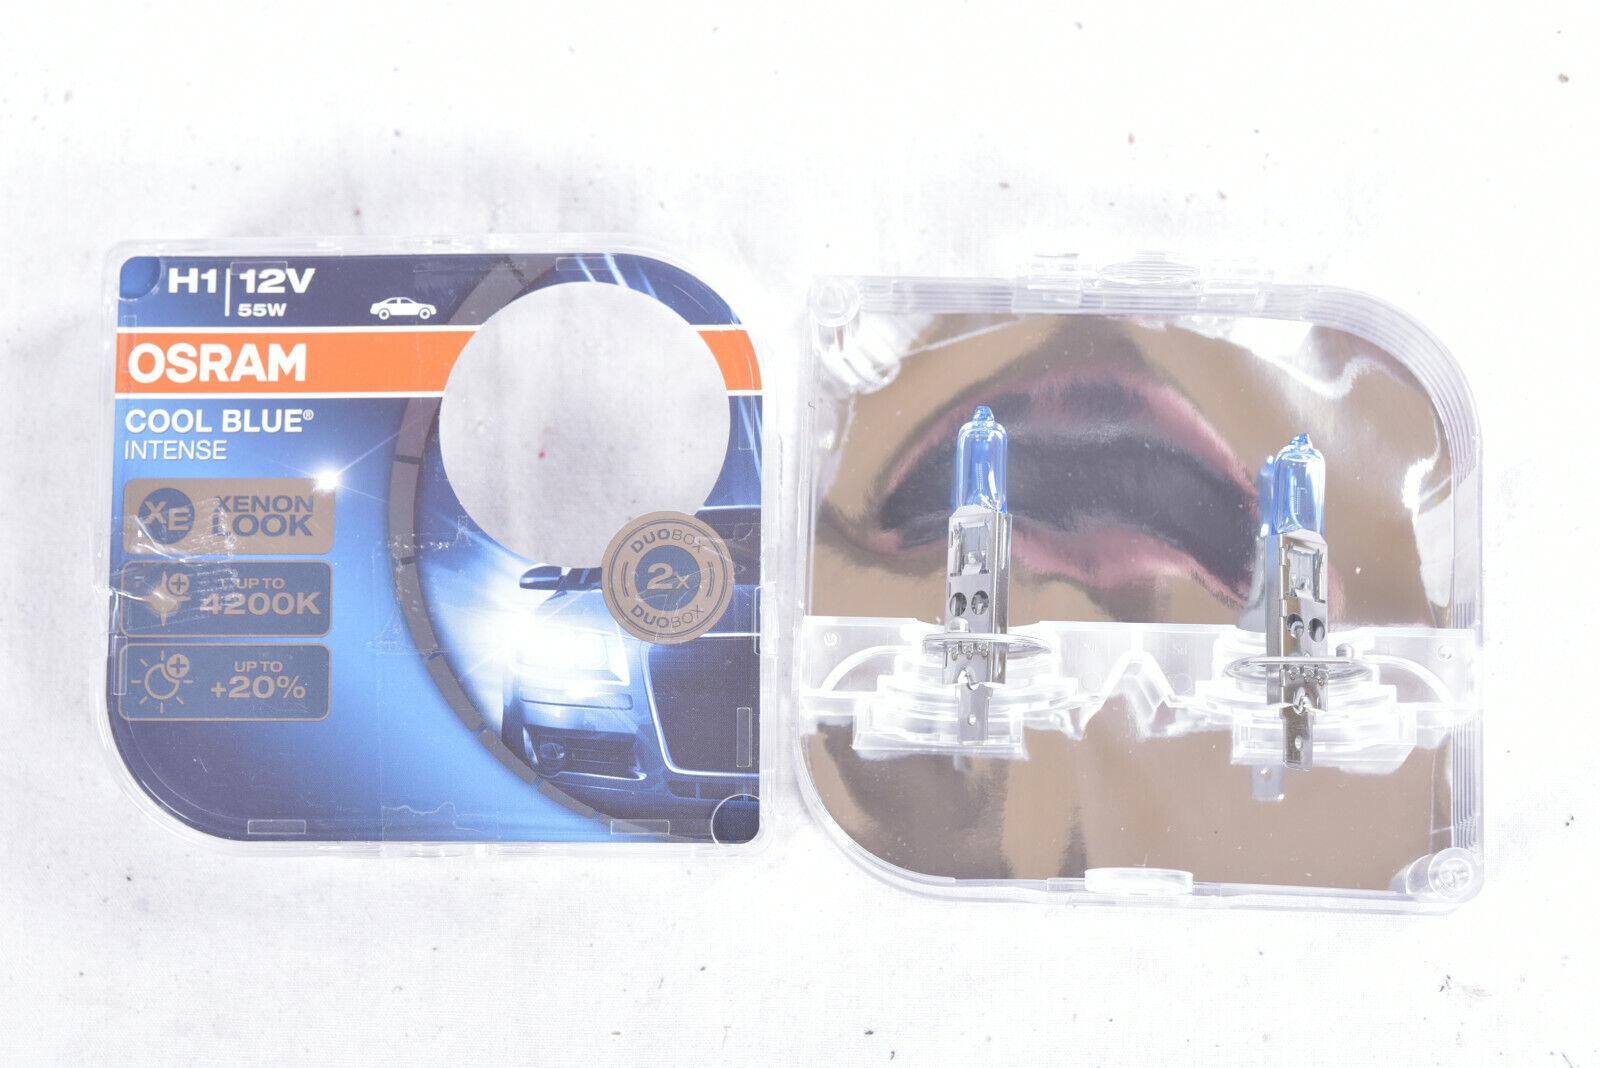 Osram COOL BLUE INTENSE H1 Glühlampen Lampe Scheinwerfer Set 4200K